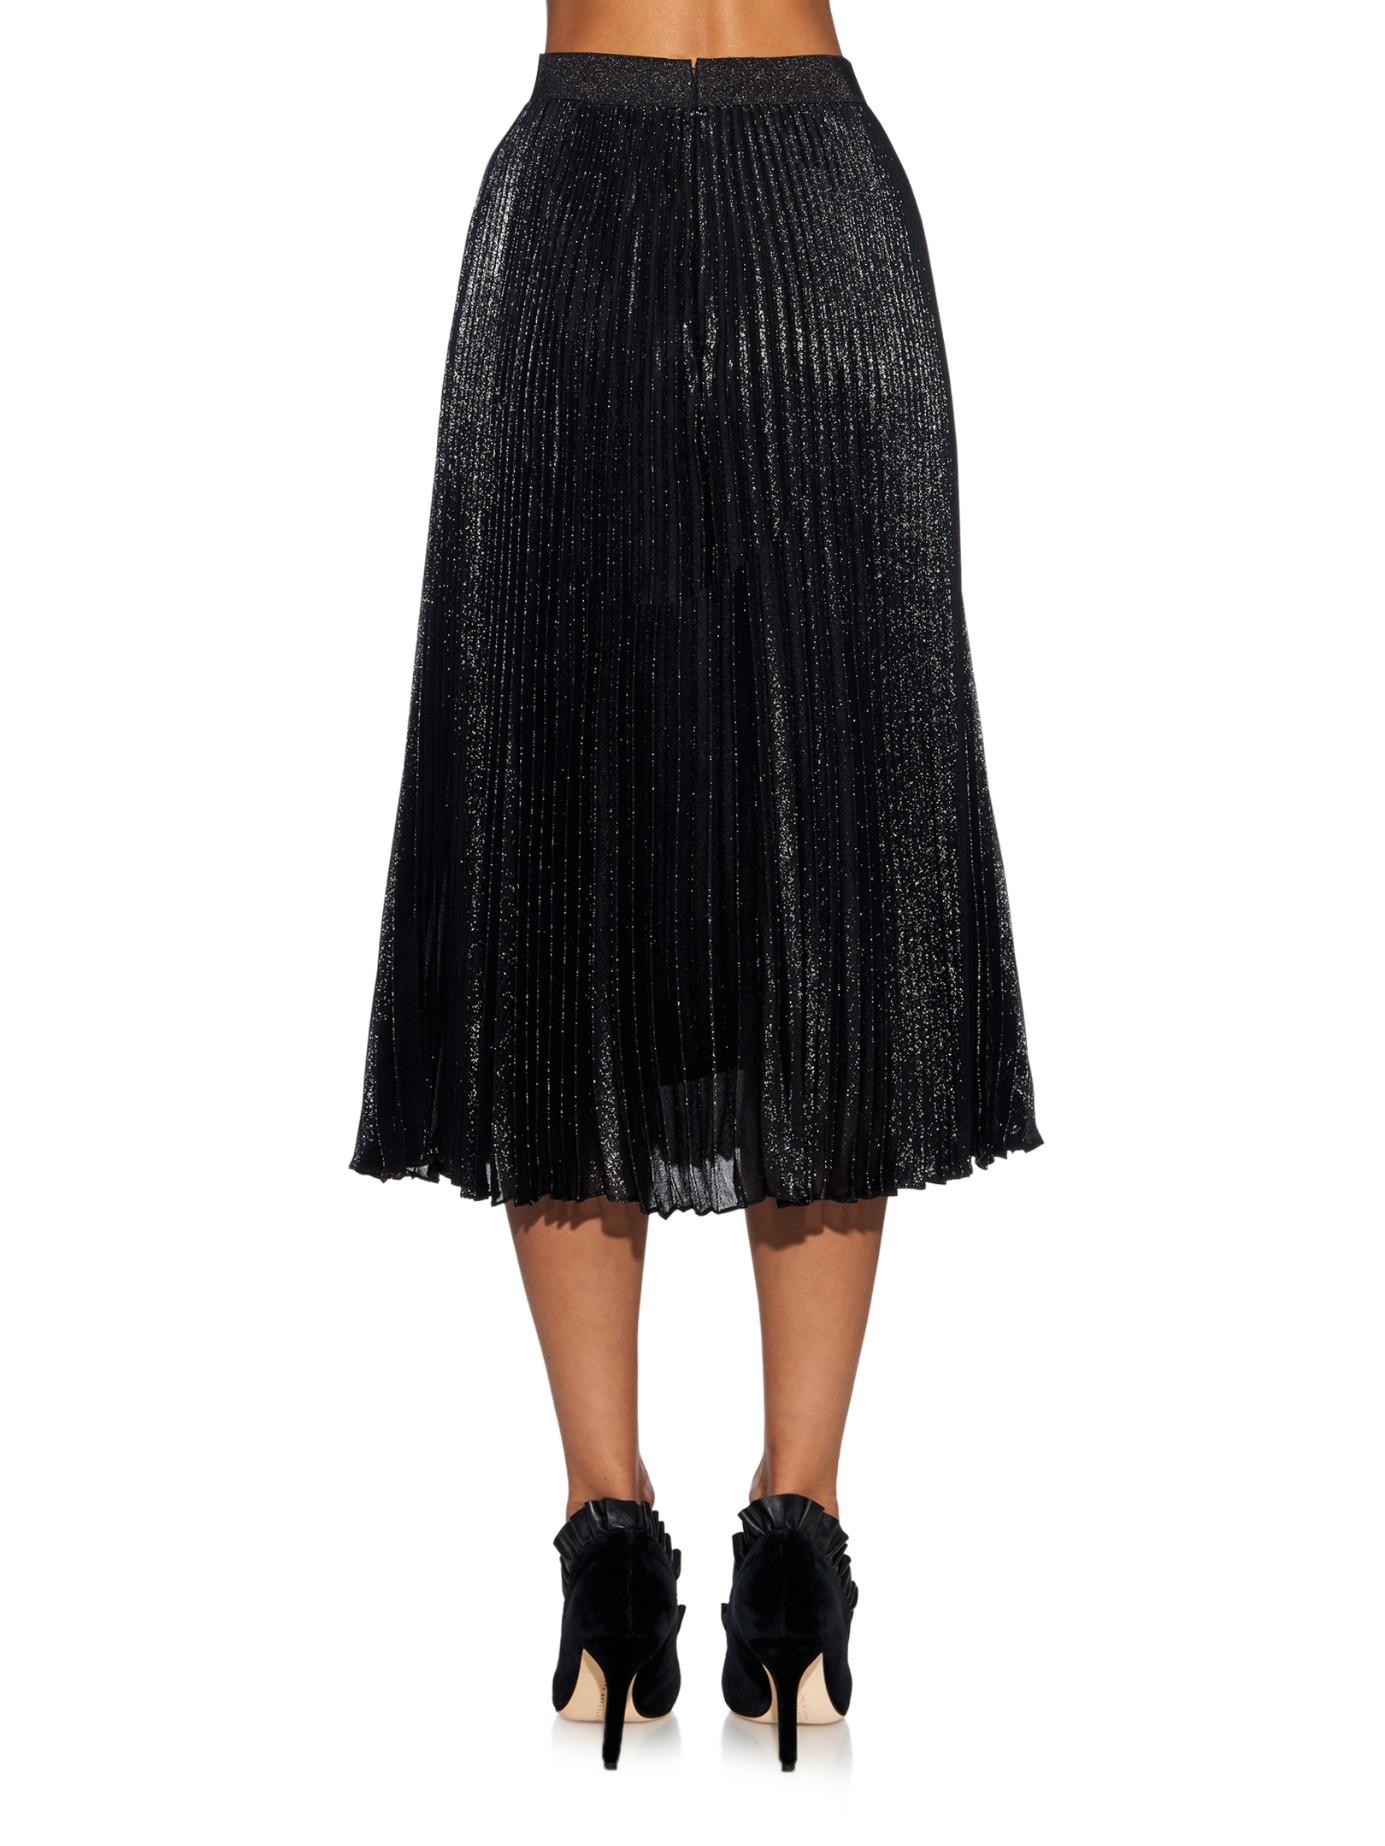 christopher metallic pleated midi skirt in black lyst